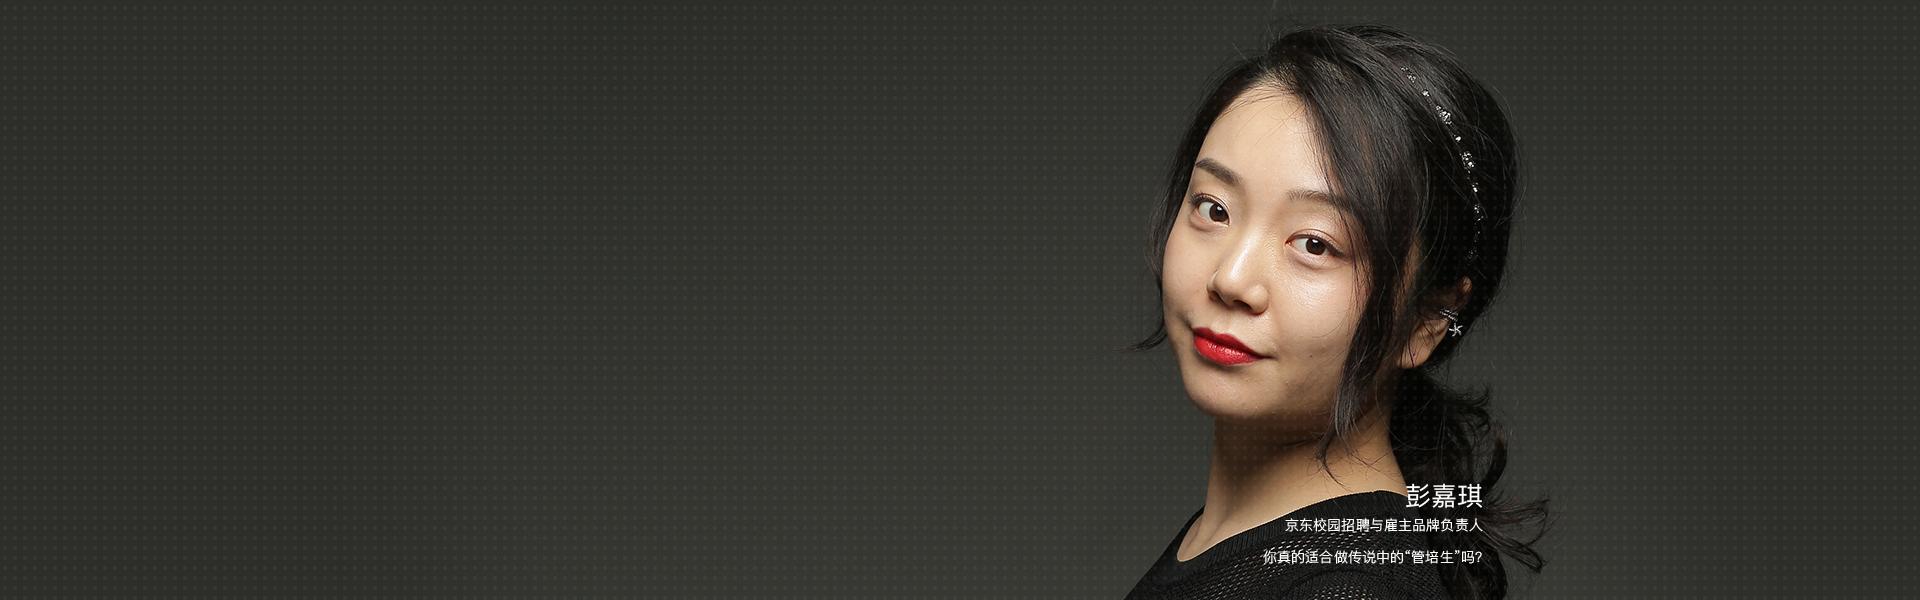 前辈 - Ashley Huang - 玛氏管理培训生项目经理